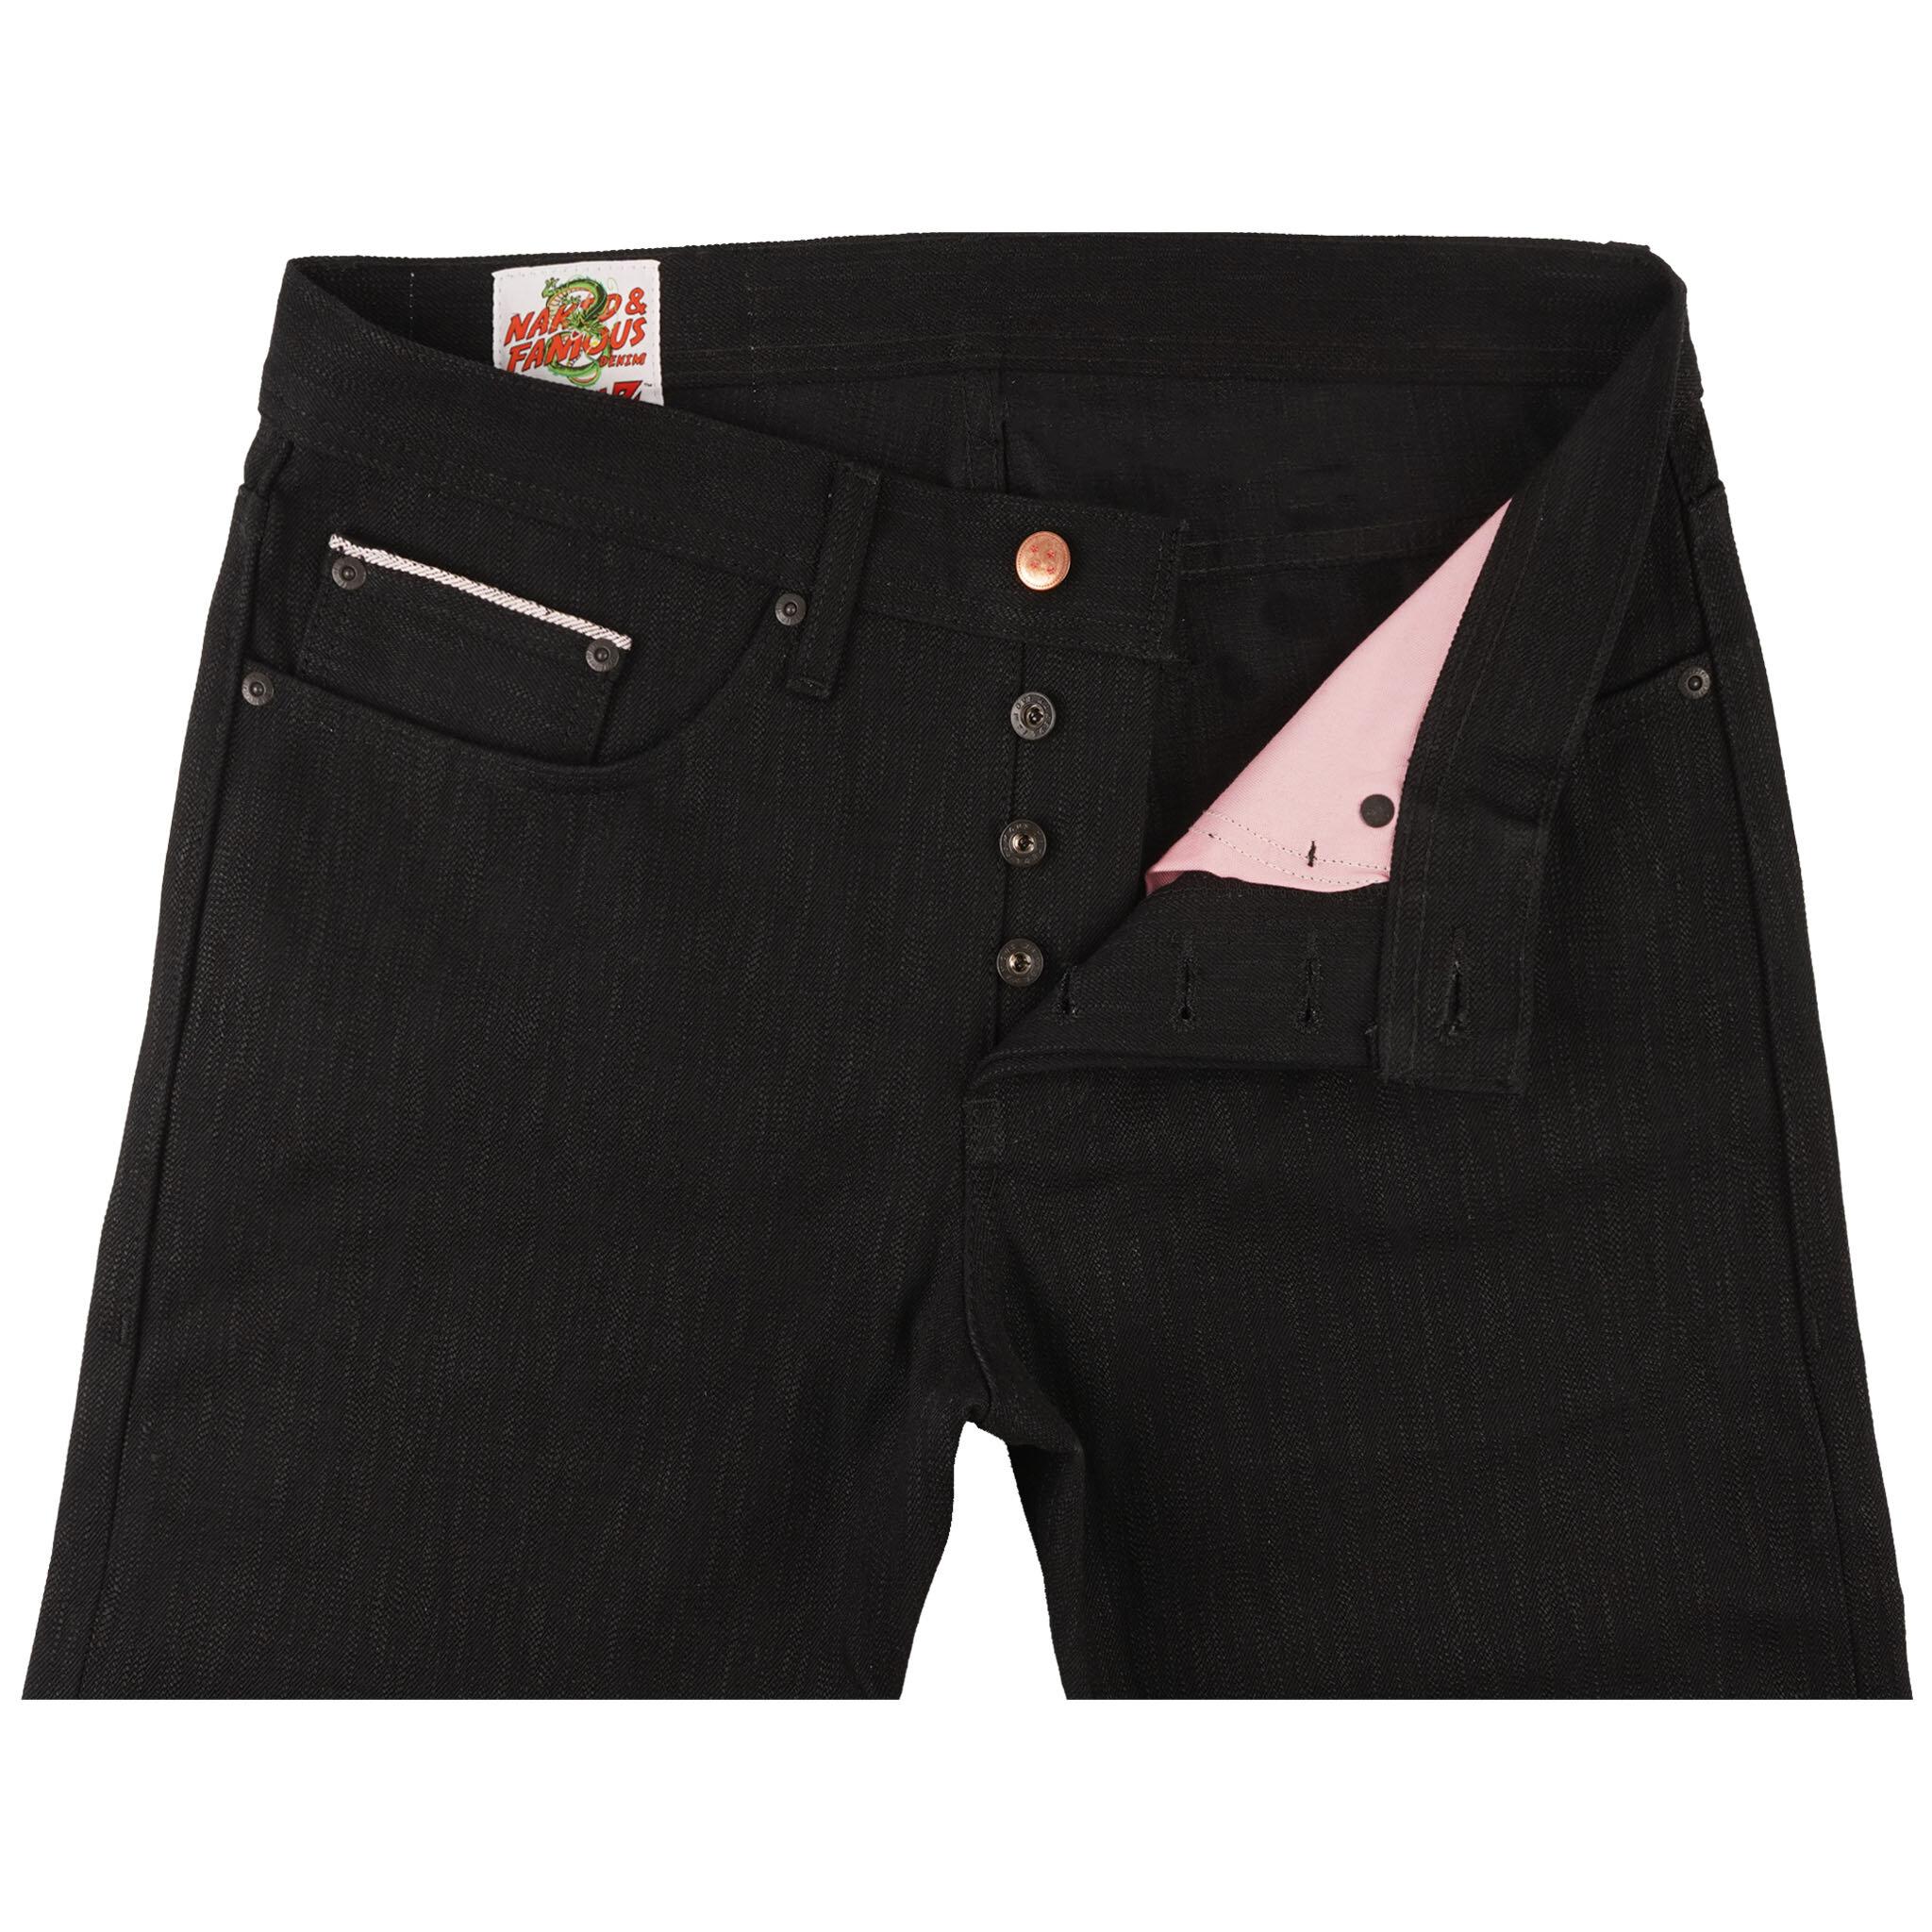 Majin Buu Innocent Selvedge jeans - front